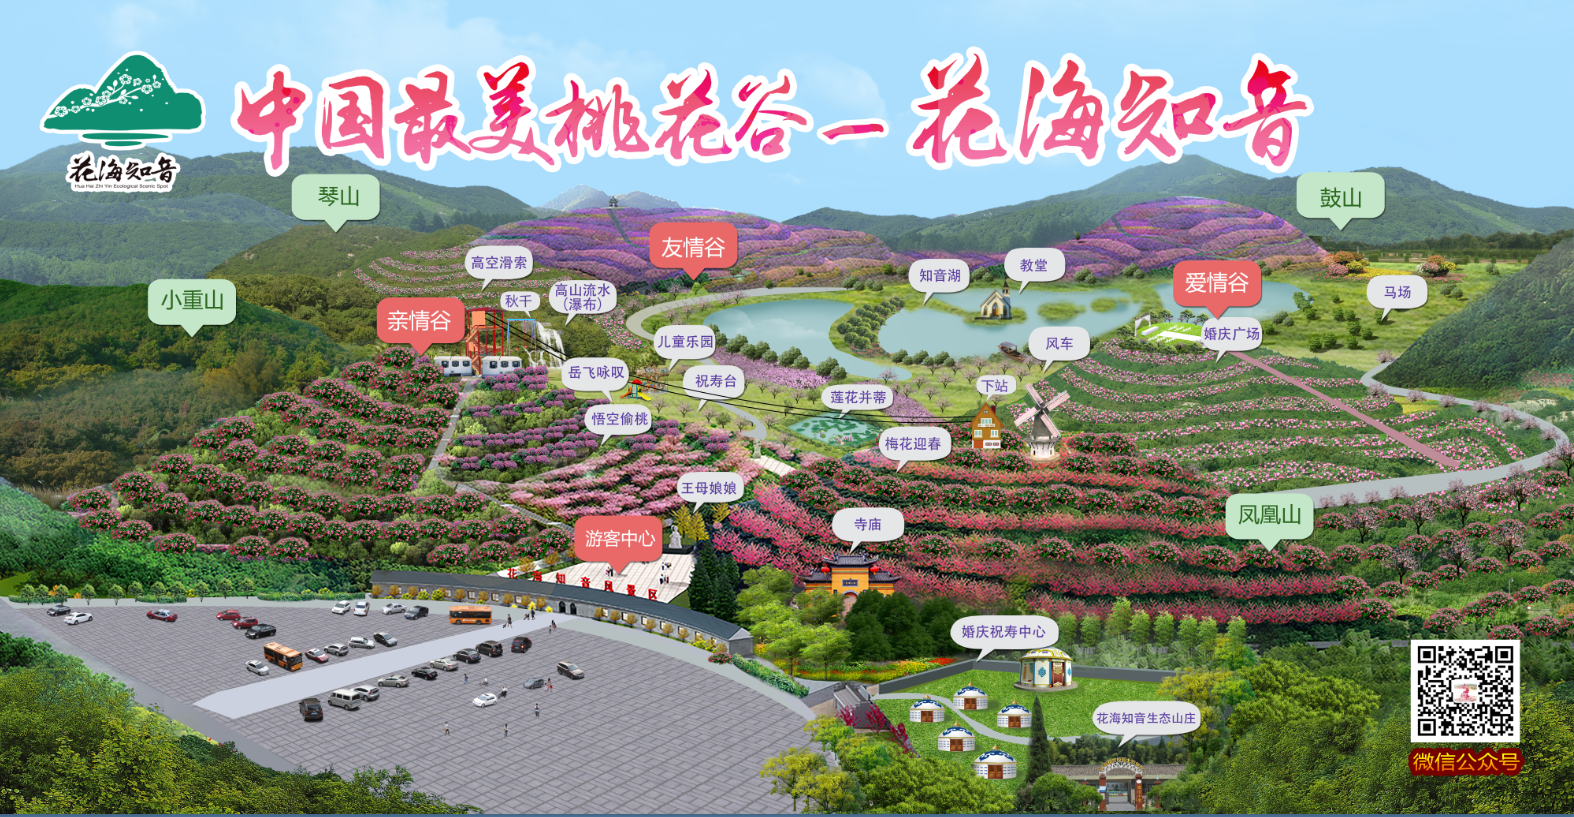 title='还地桥第二届城山•花海知音桃花节'